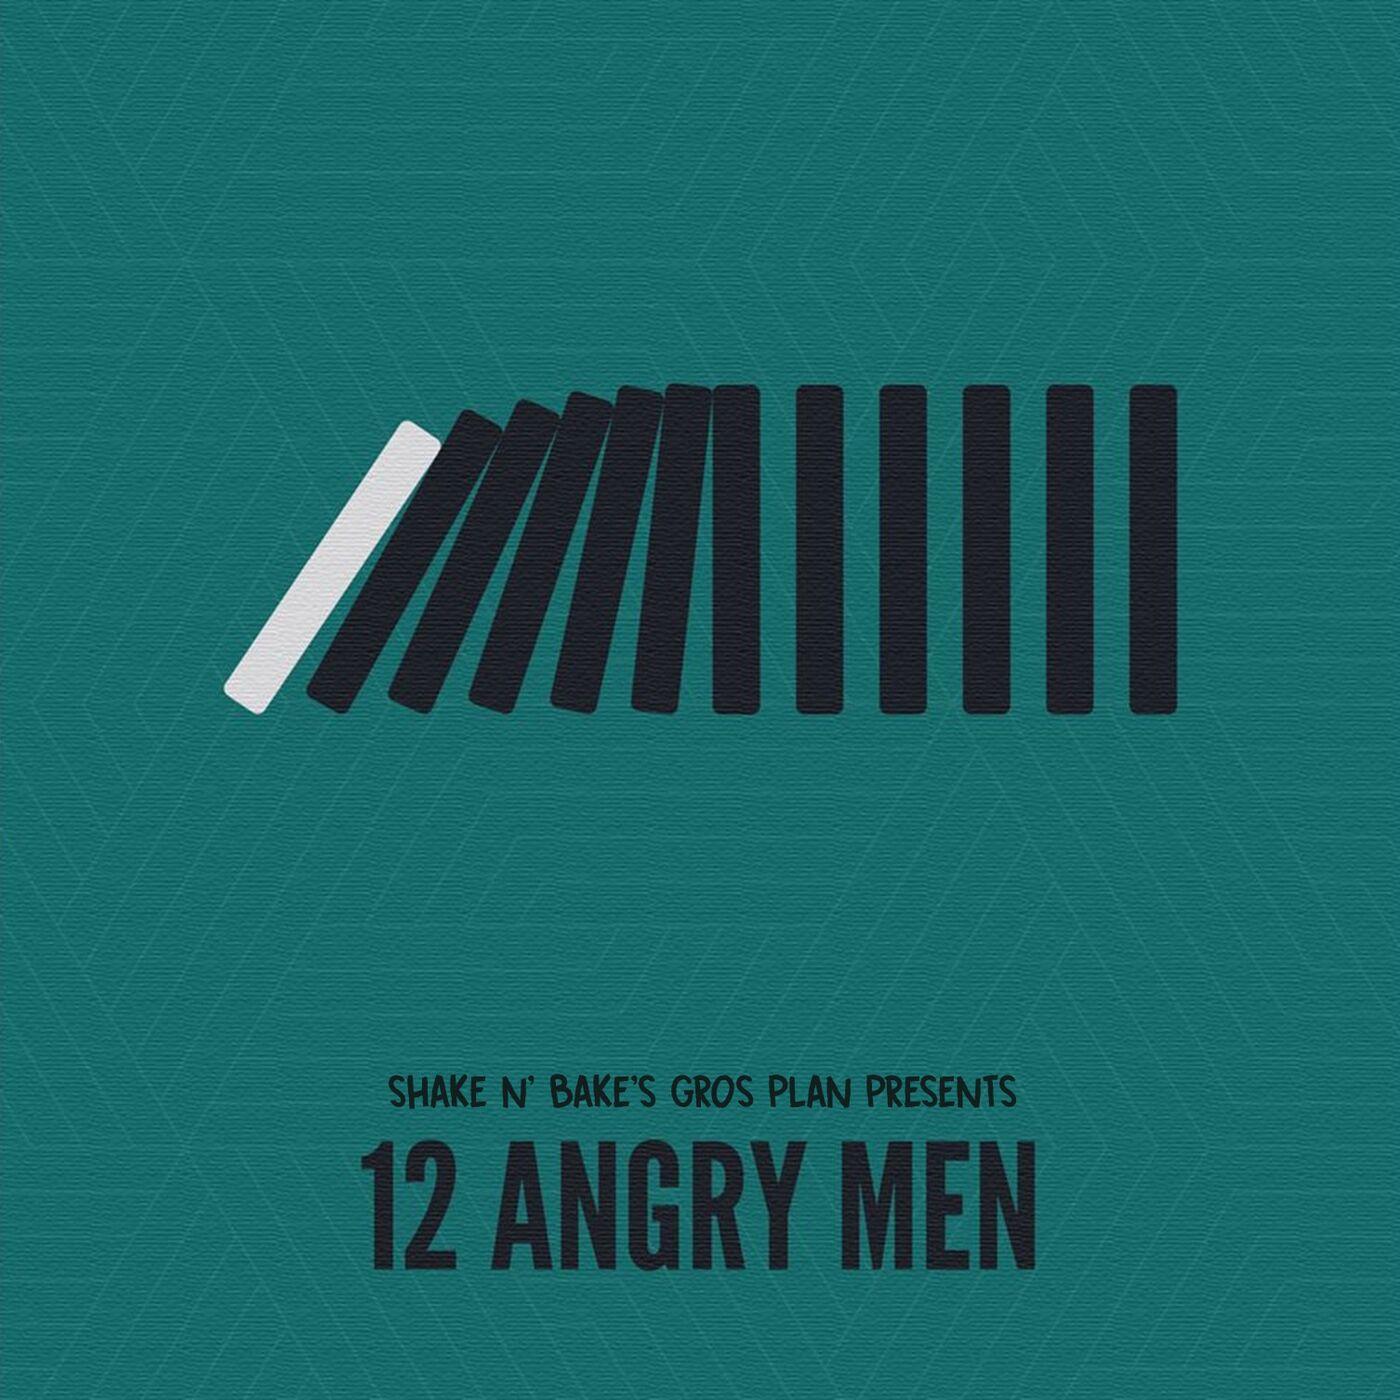 Shake n' Bake: S05E10 - 12 Angry Men